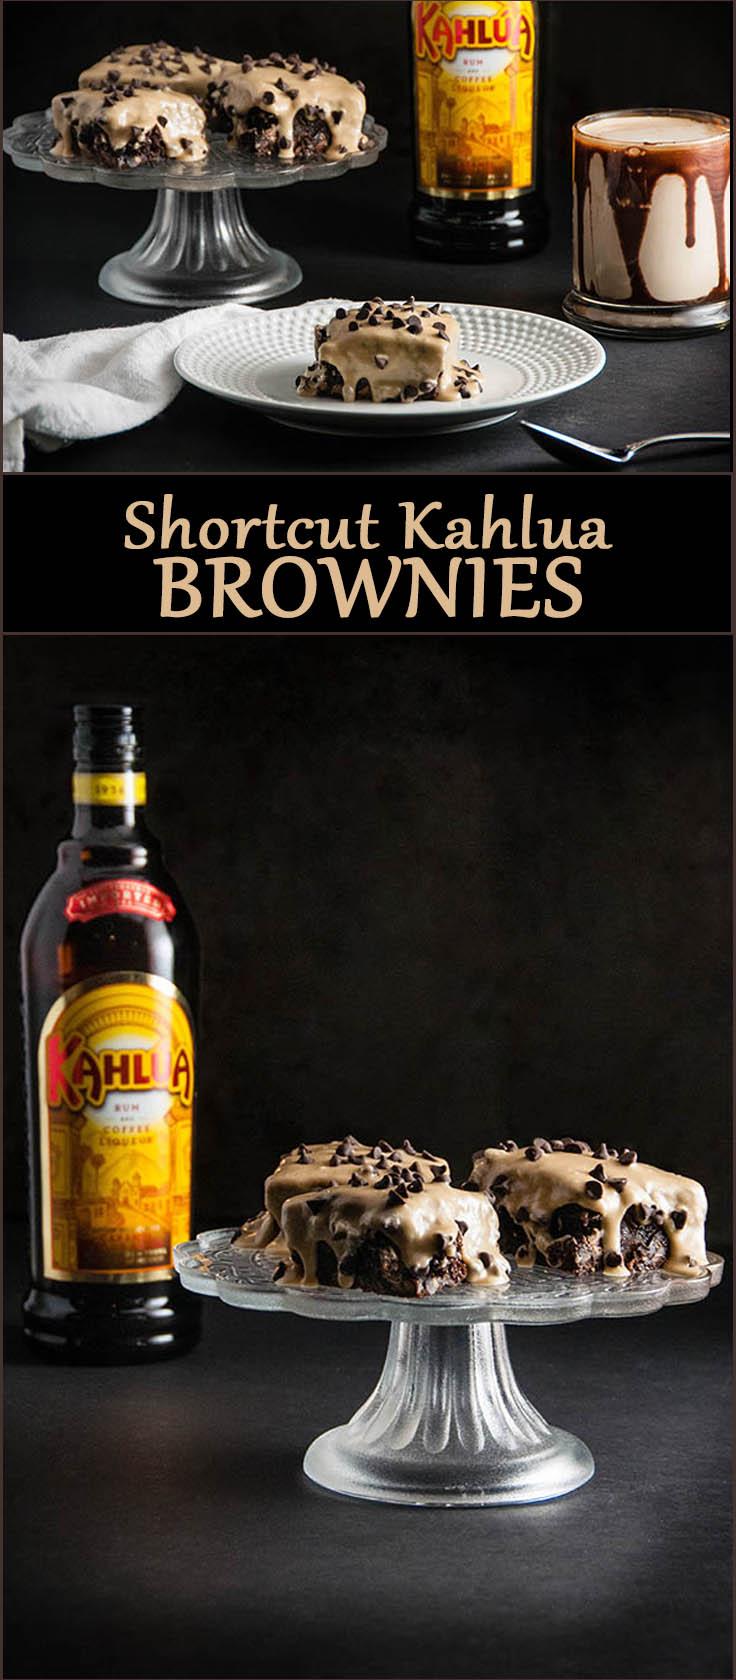 Easy Shortcut Boozy Kahlua from www.SeasonedSprinkles.com